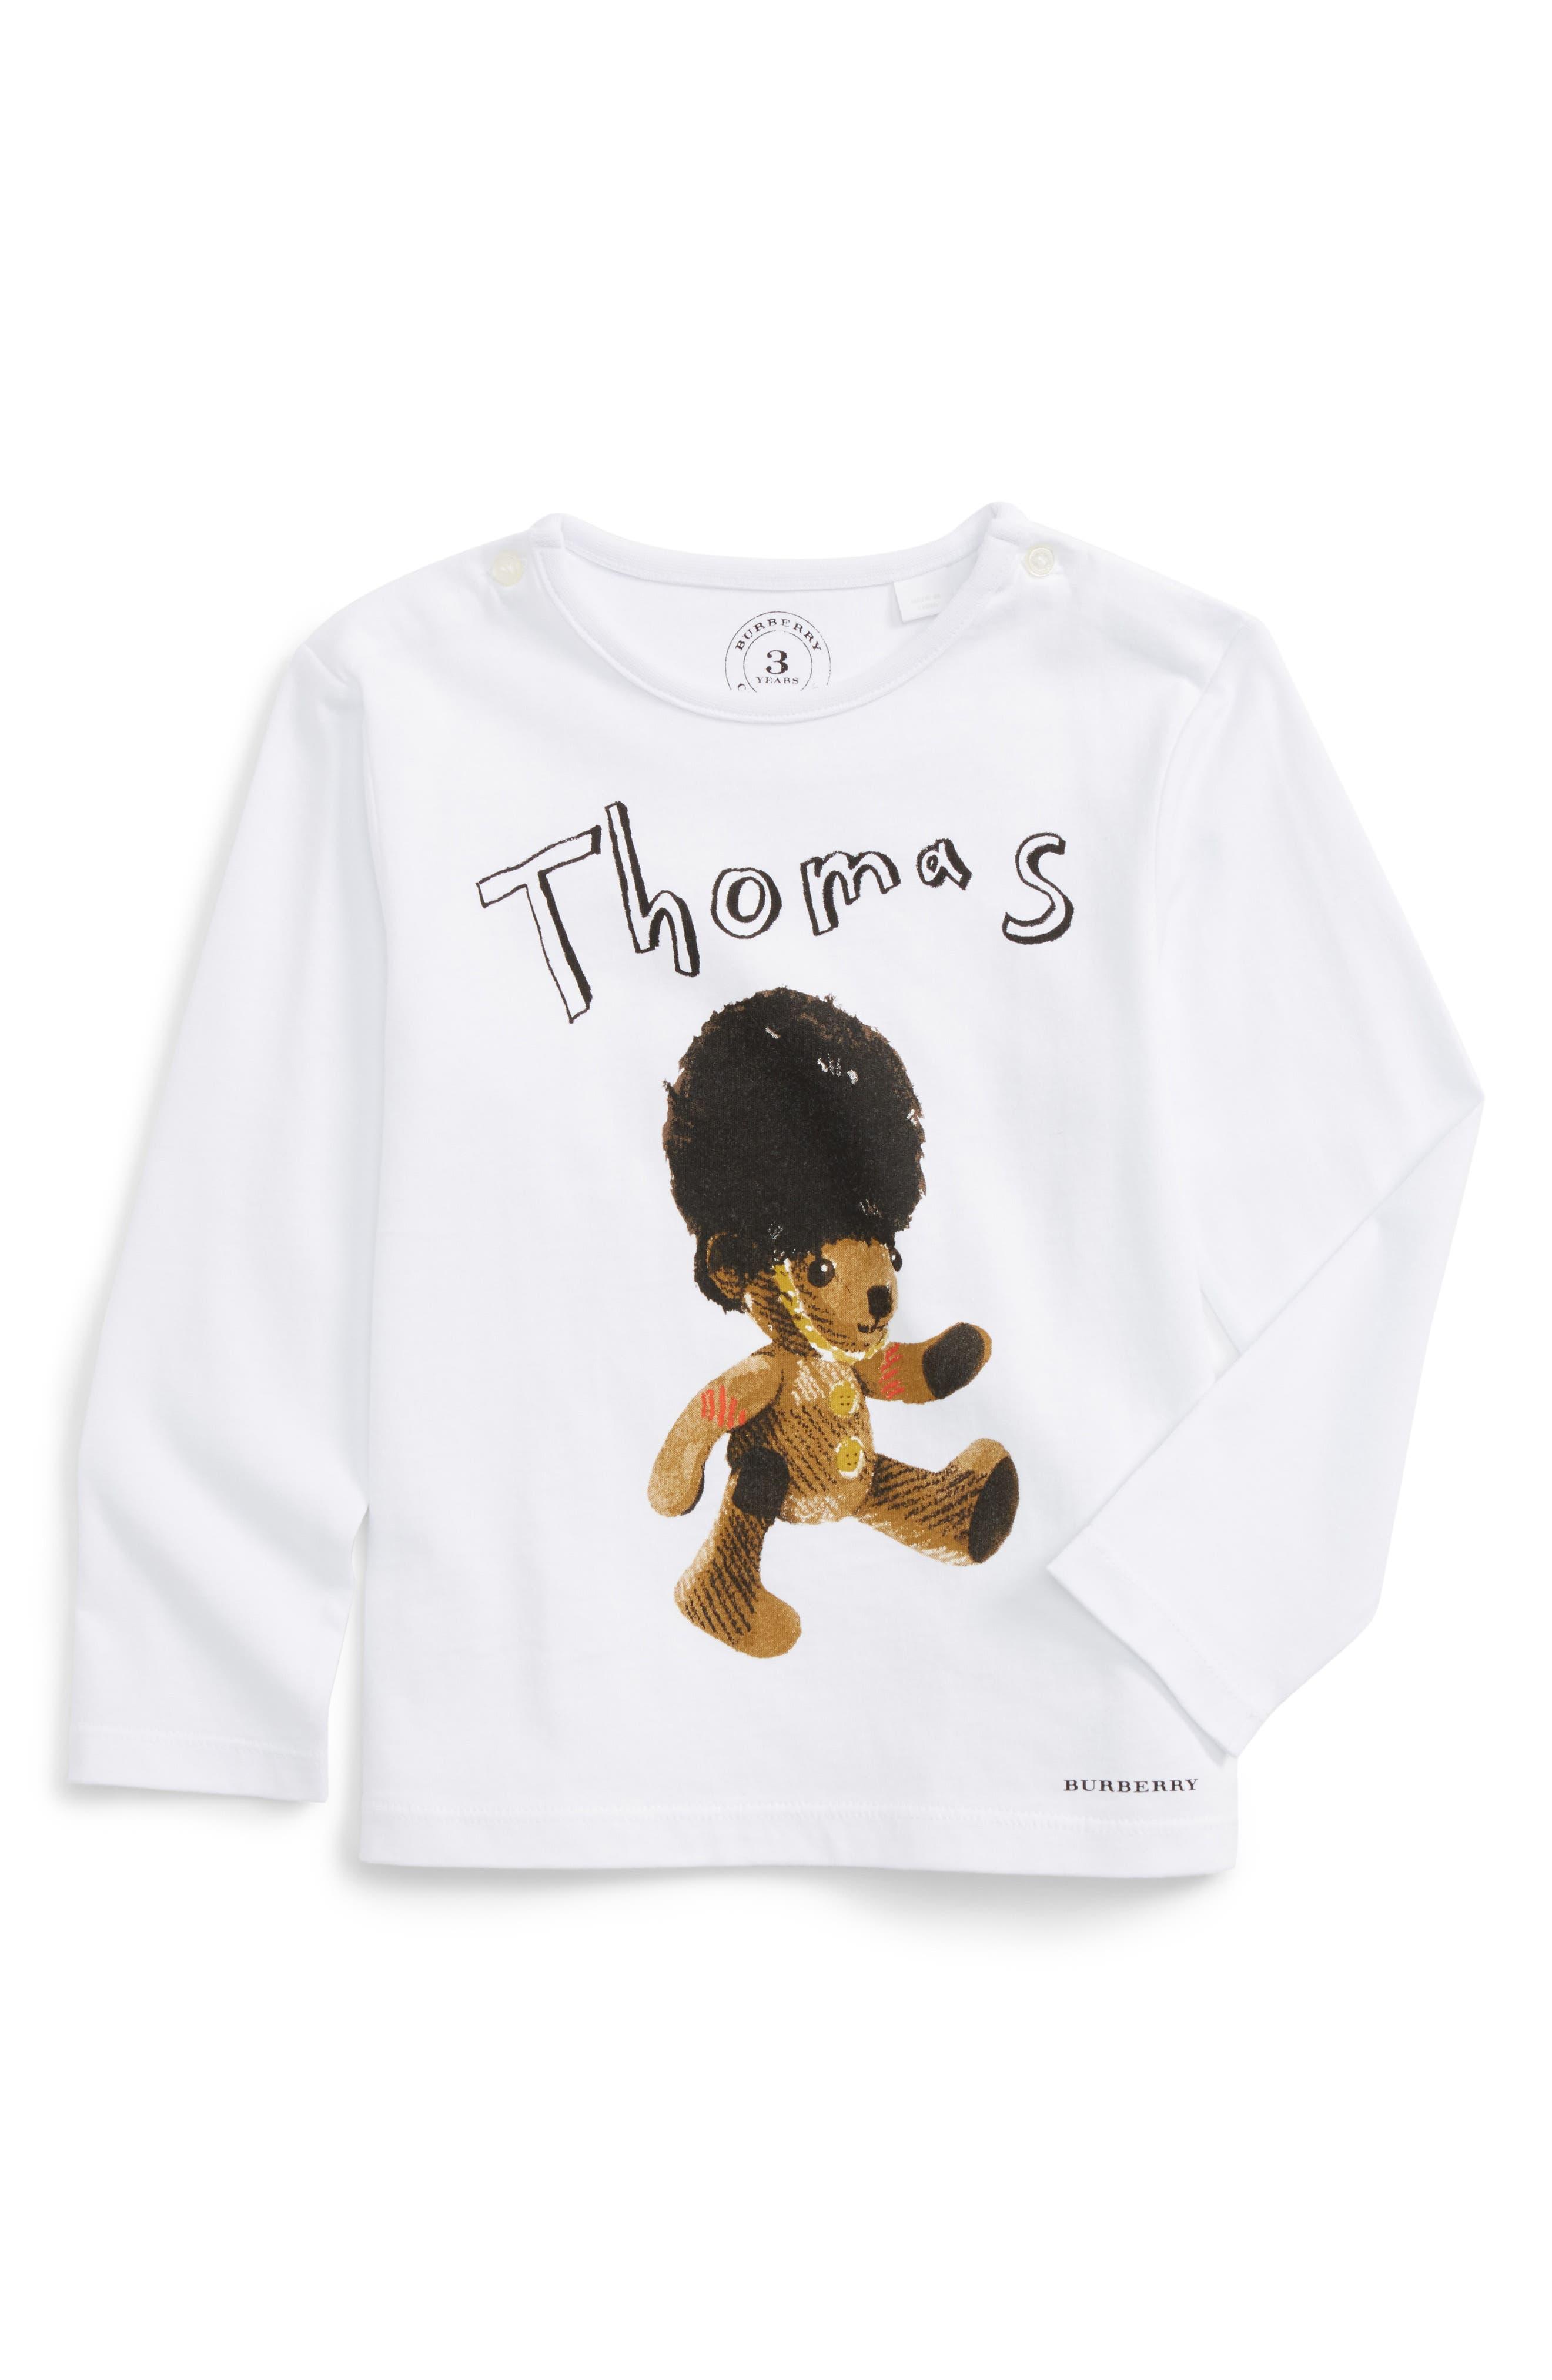 BURBERRY Thomas Bear Graphic T-Shirt